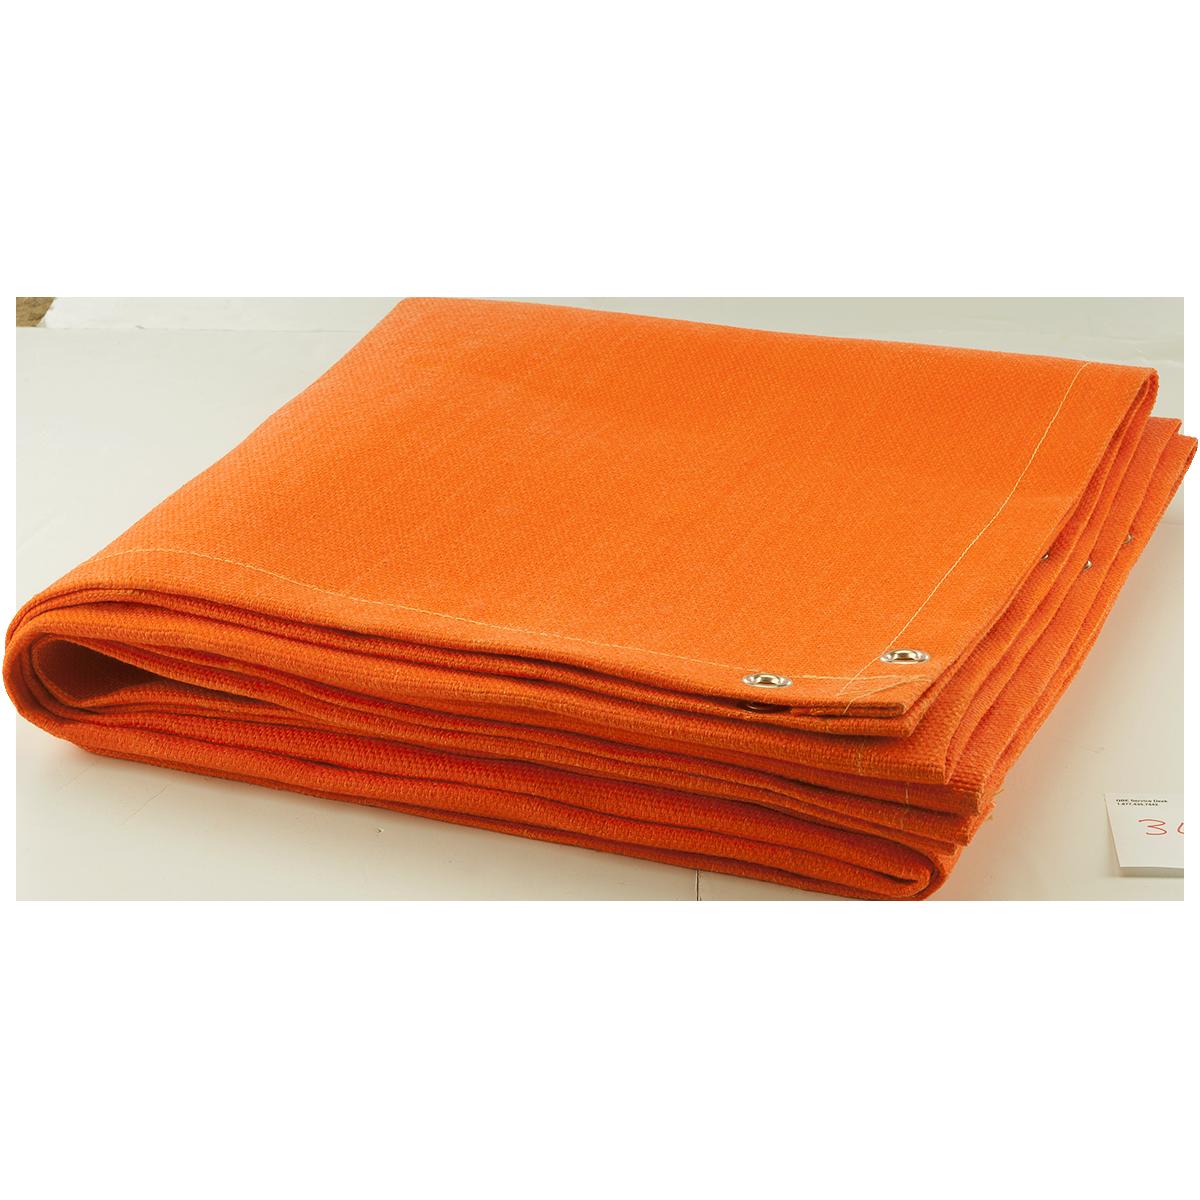 Orangeglass 32 Oz Orange Fiberglass Welding Blanket